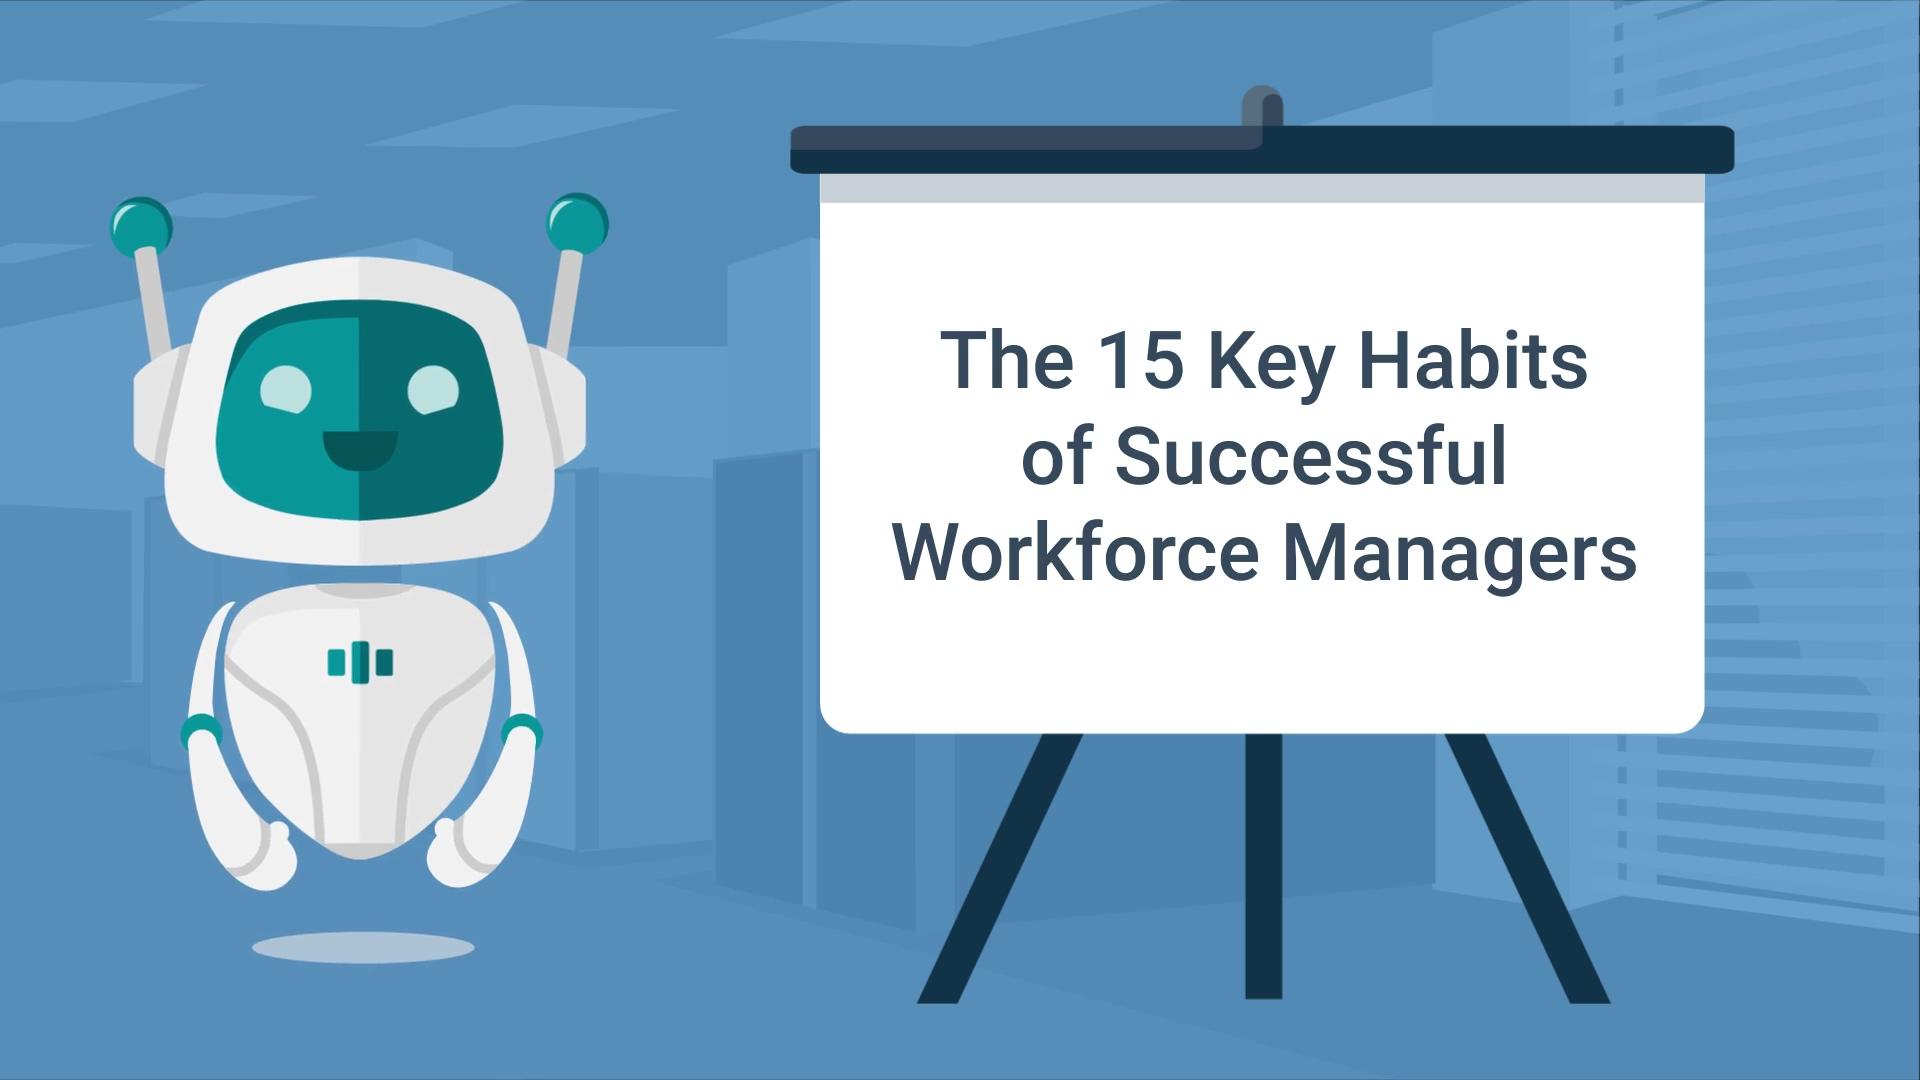 2019-05-03_15_Key_Habits_Of_Successful_Workforce_Managers_EN